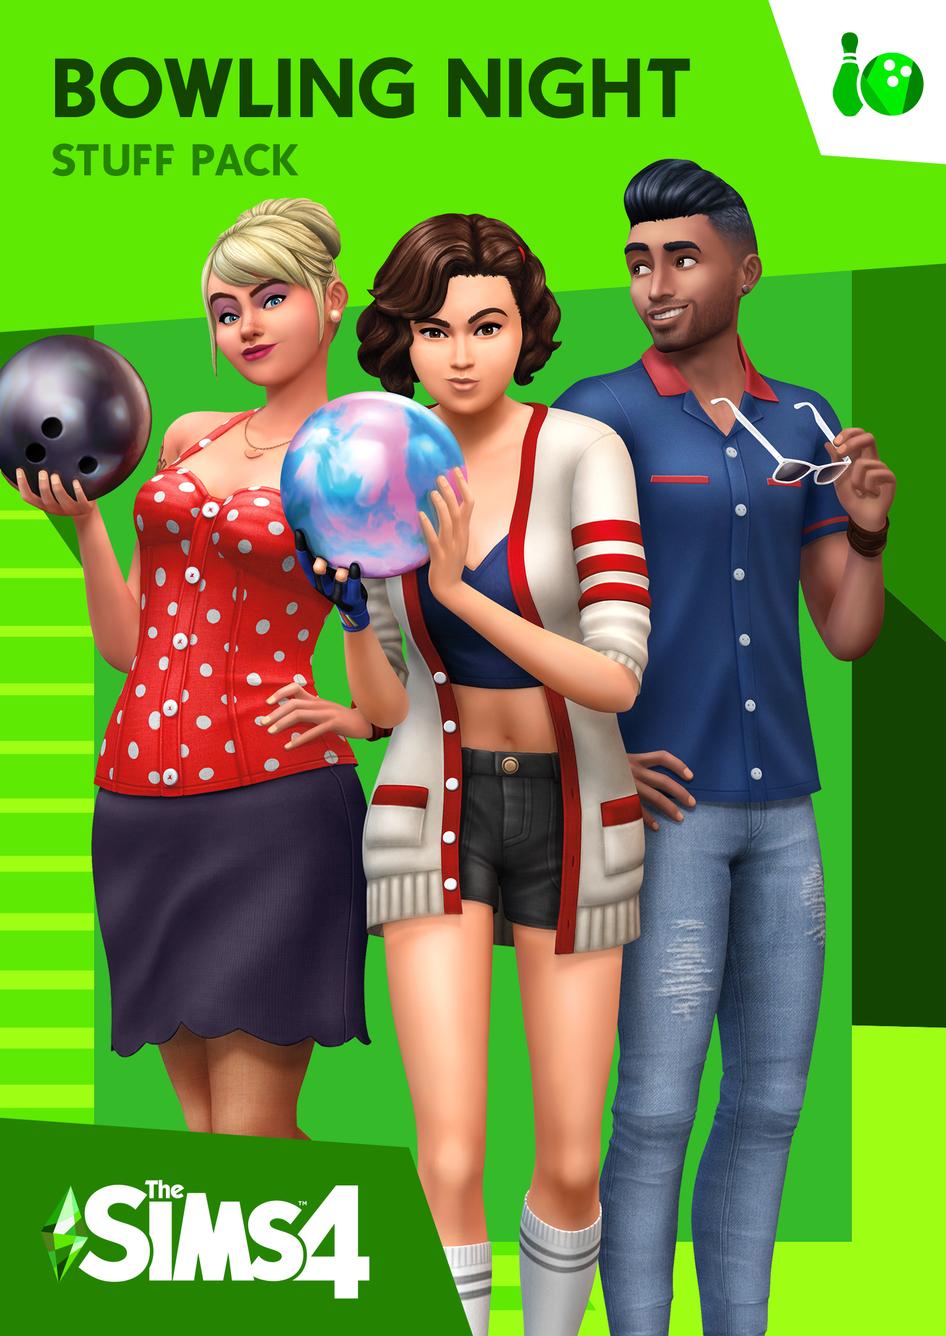 The Sims 4 Bowling Night Stuff - Origin